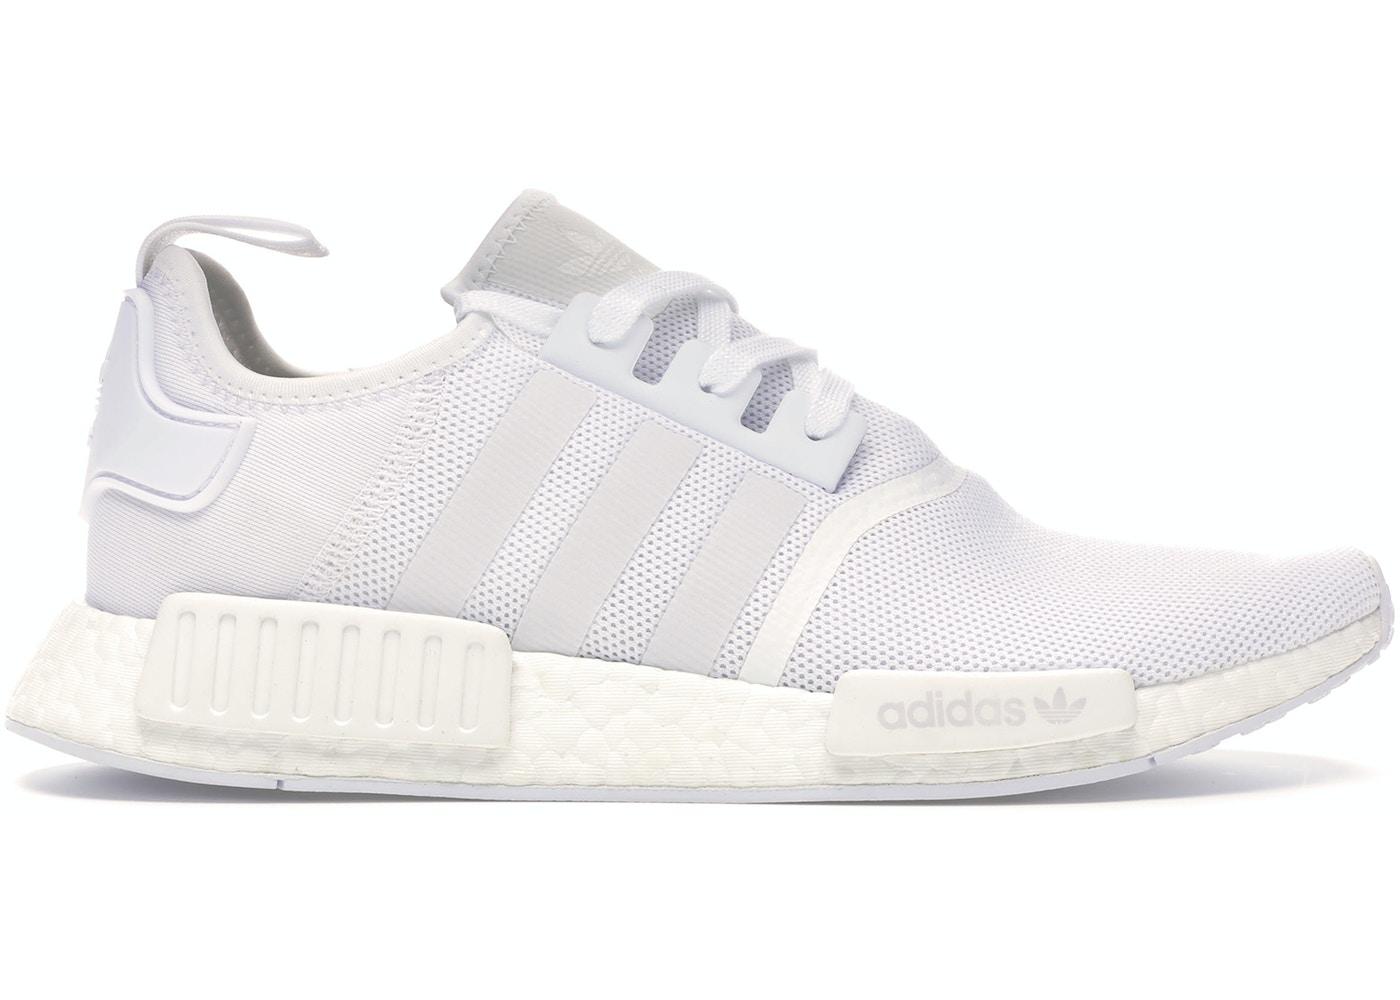 Adidas Nmd R1 Triple White Ba7245